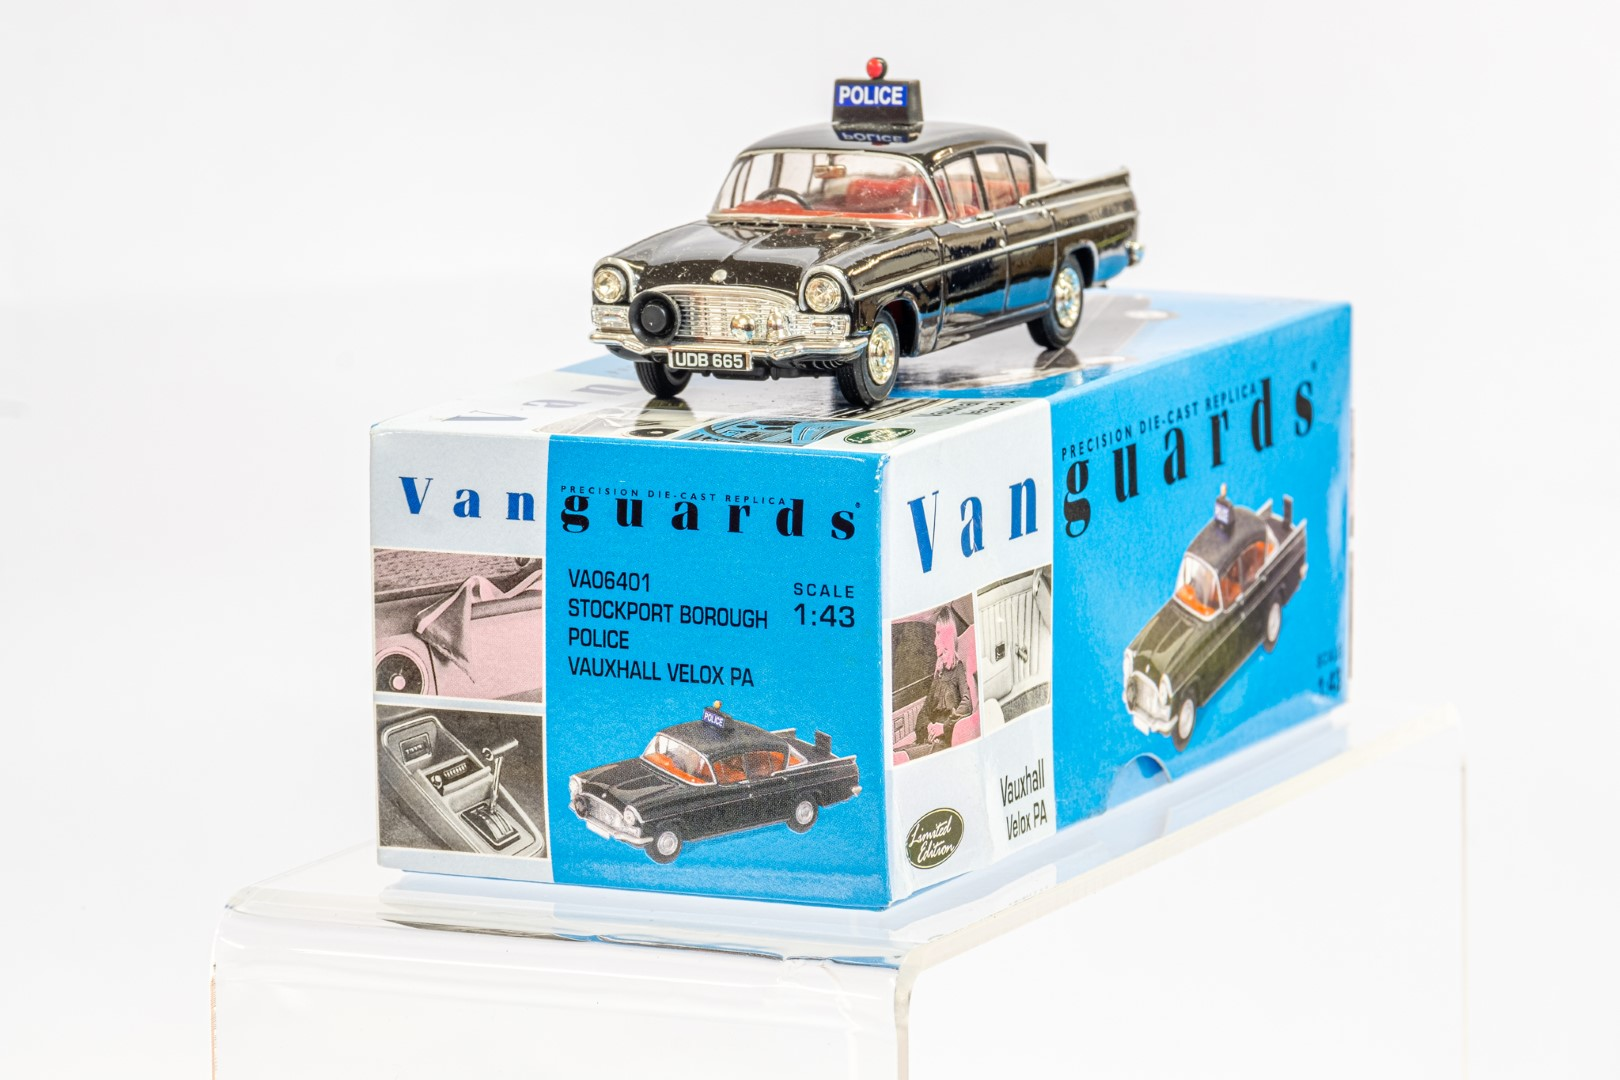 Vanguards Vauxhall Velox PA - Stockport Borough Police - Image 3 of 8